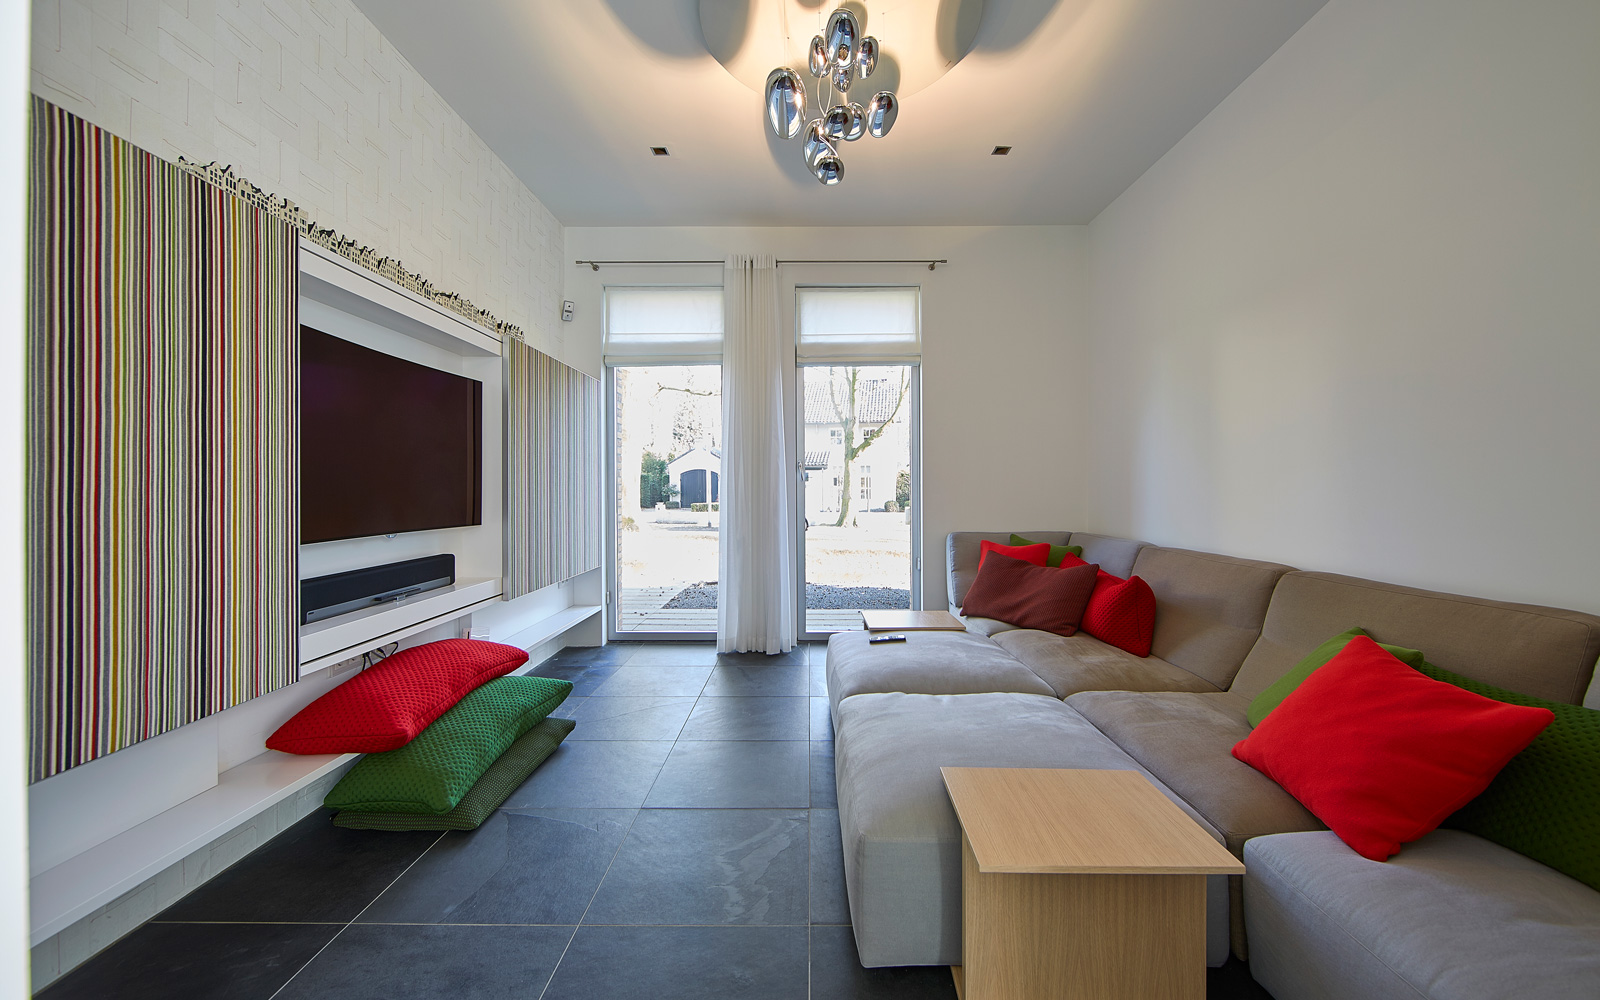 woonkamer, zithoek, televisie, bank, hoekbank, grote ramen, leefbare villa, Nanne Schuiveling